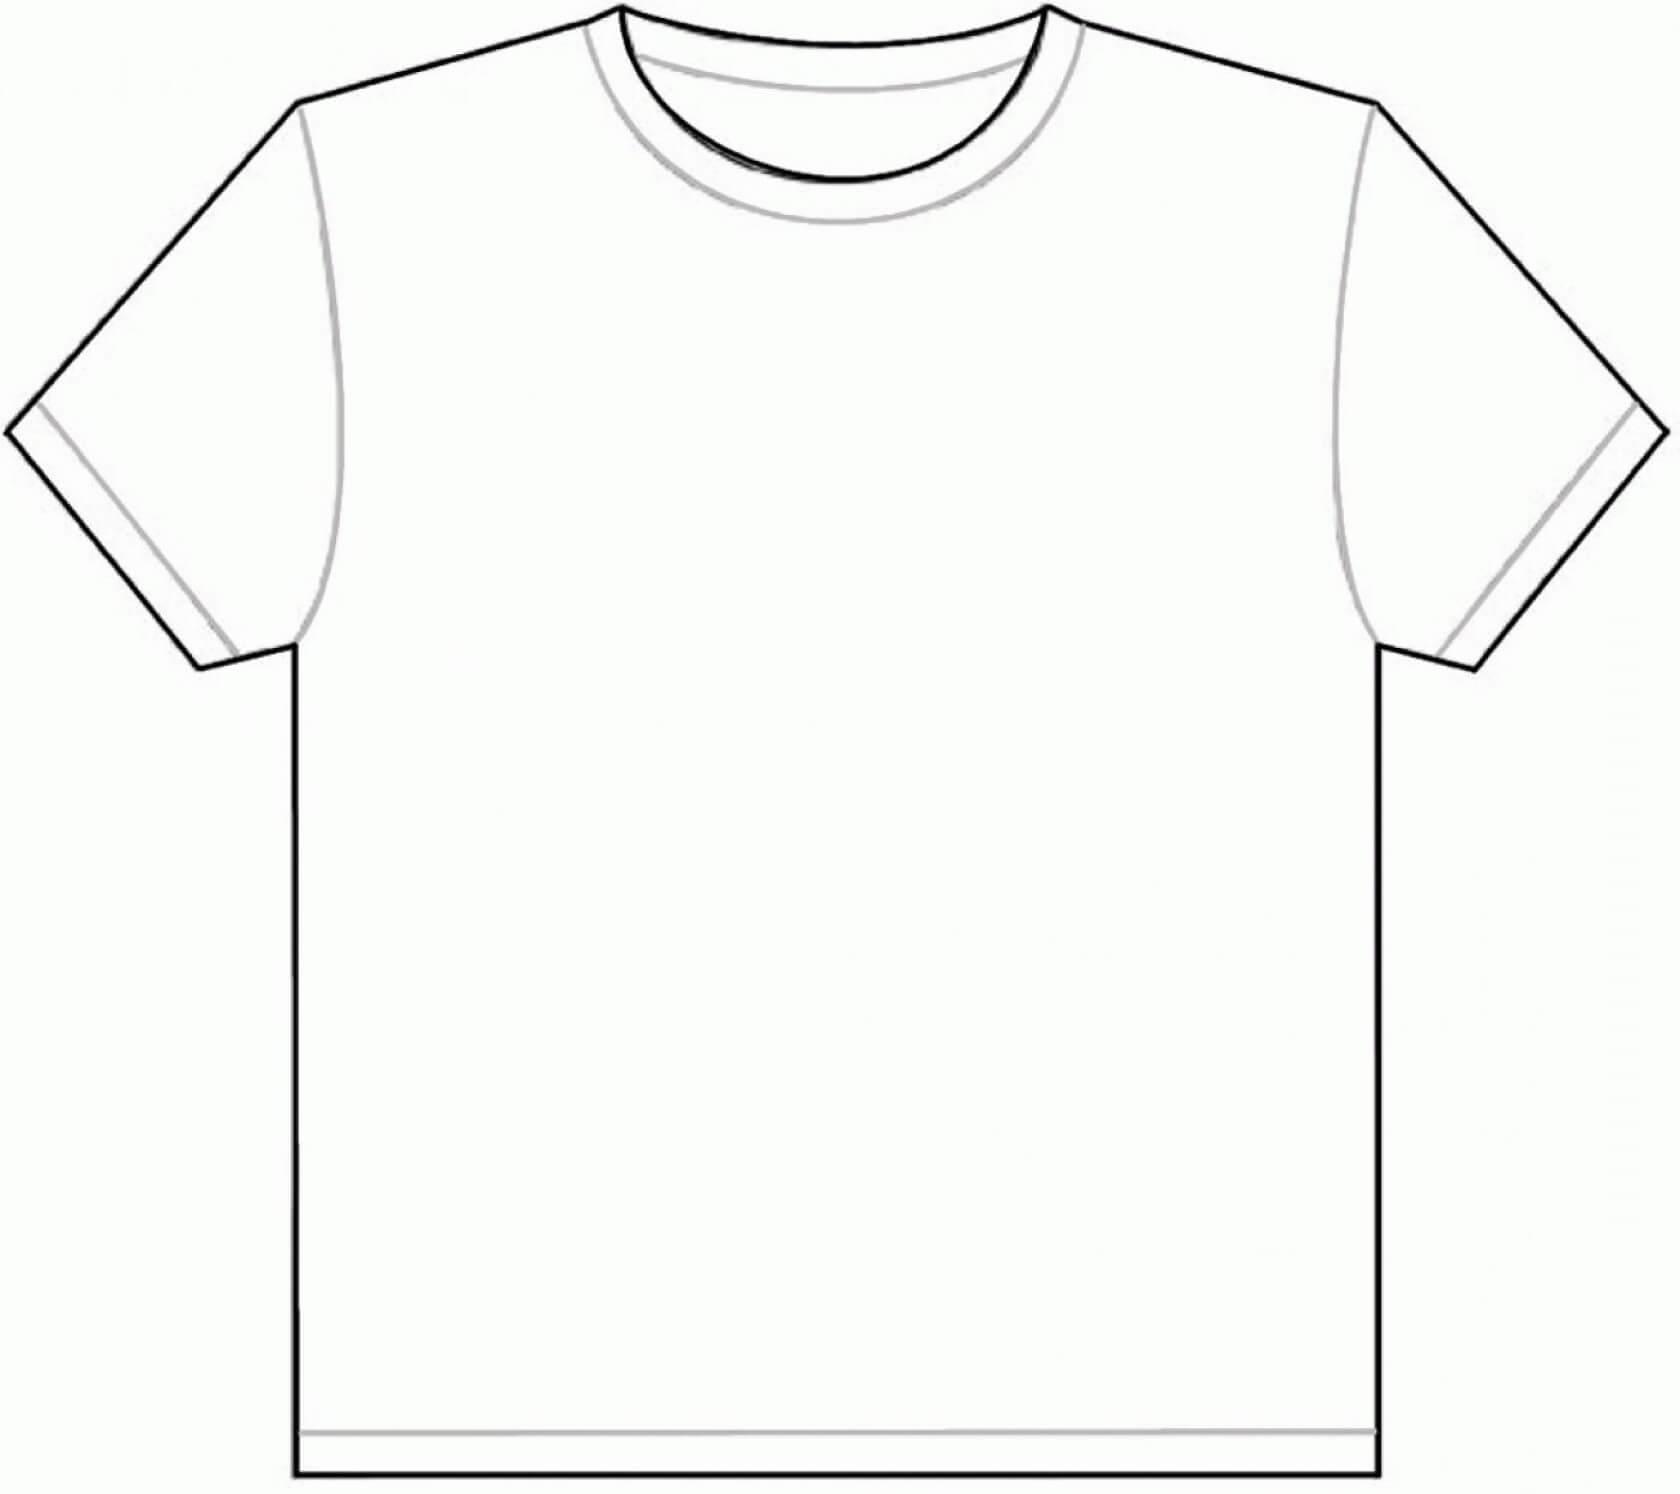 006 Blank Tee Shirt Template T Shirts Vector Beautiful Ideas For Blank Tee Shirt Template